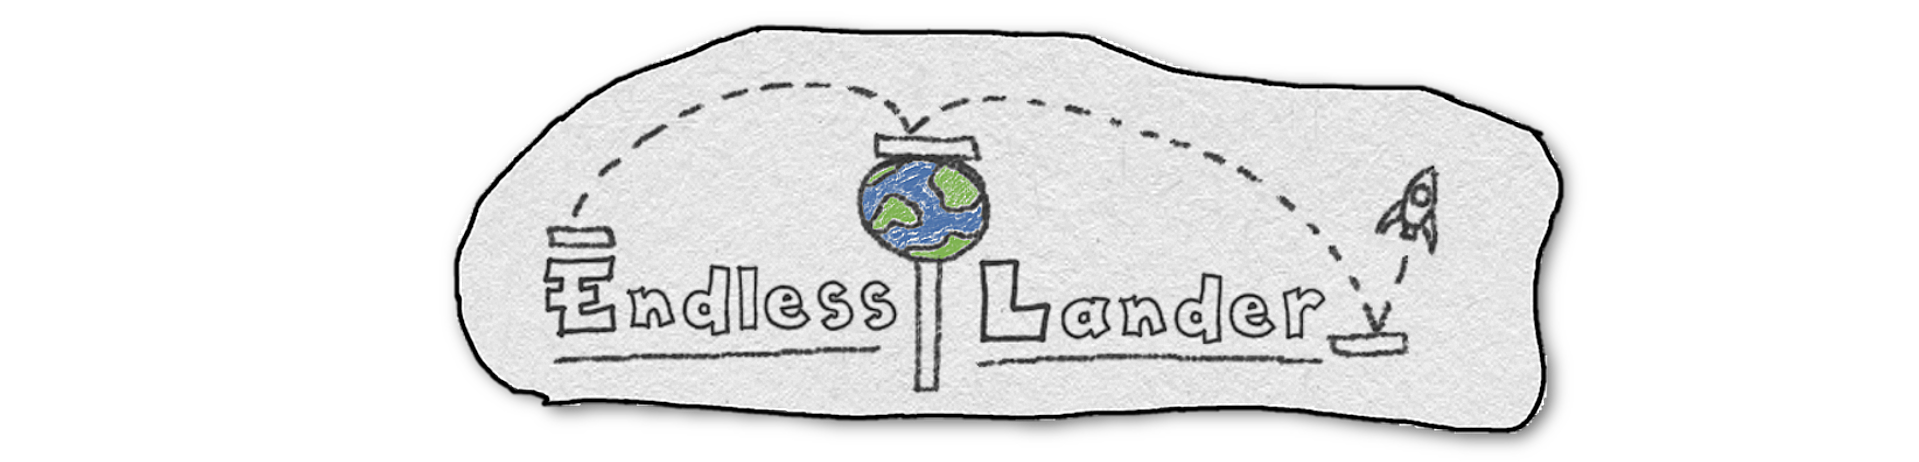 Endless Lander